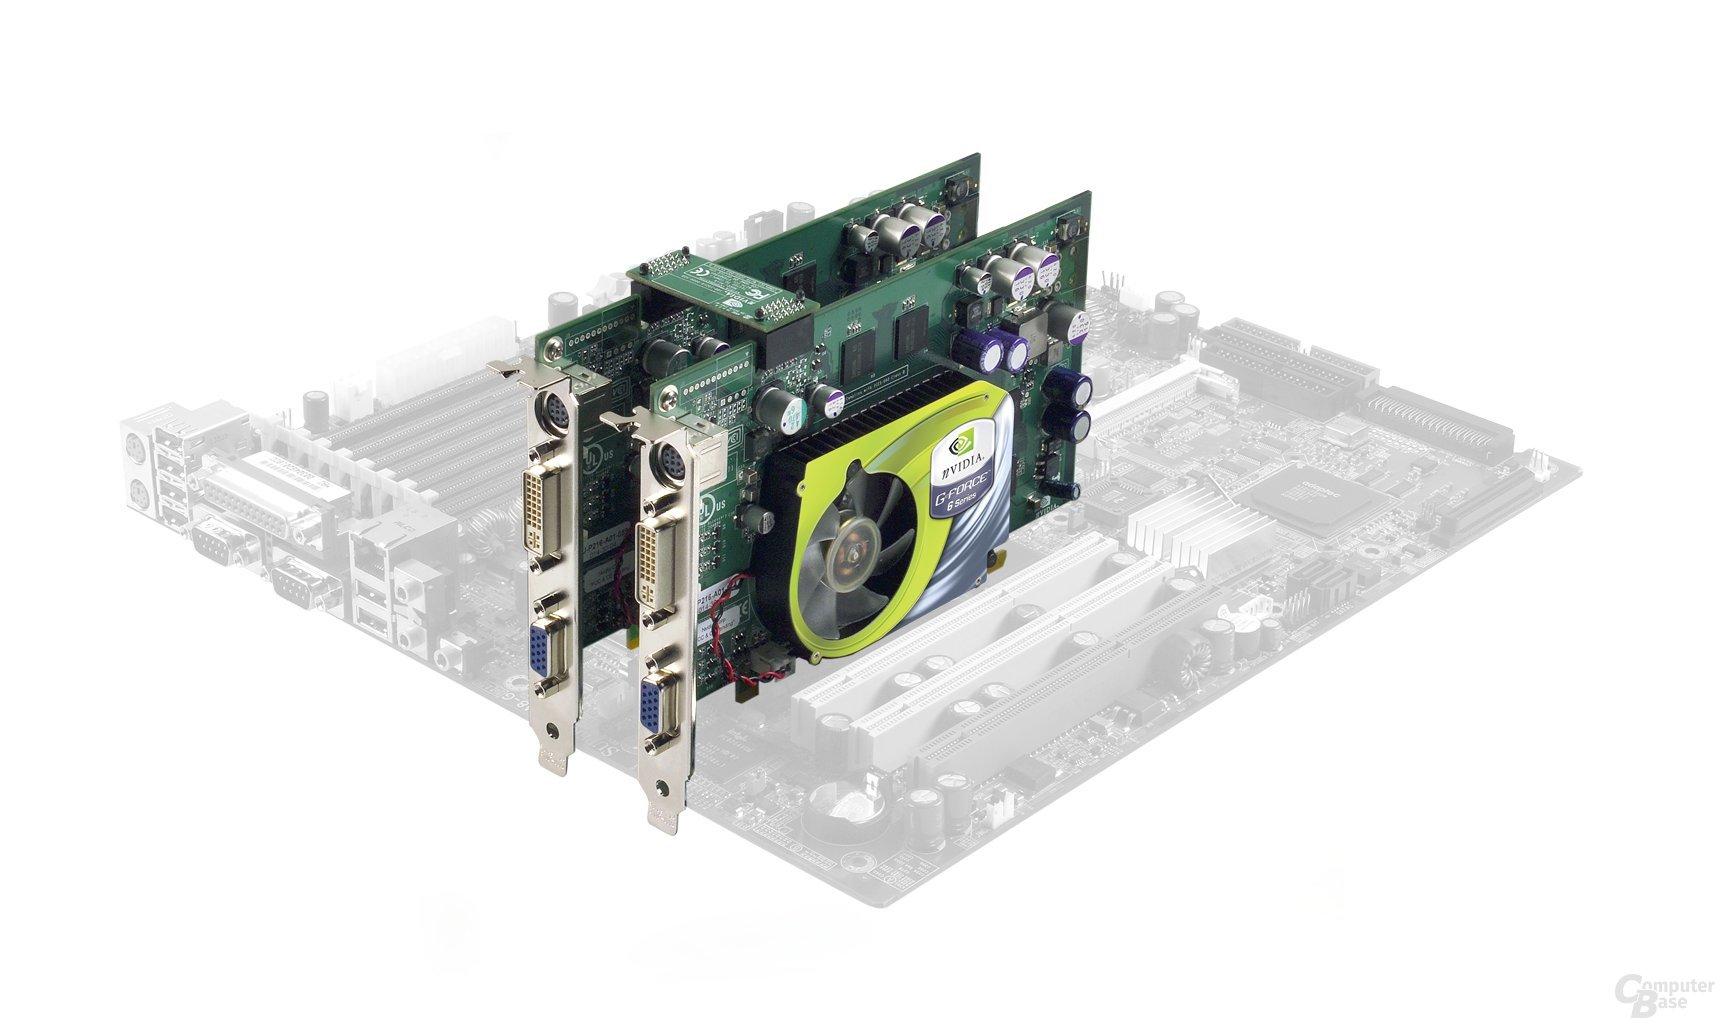 GeForce 6600 GT SLI